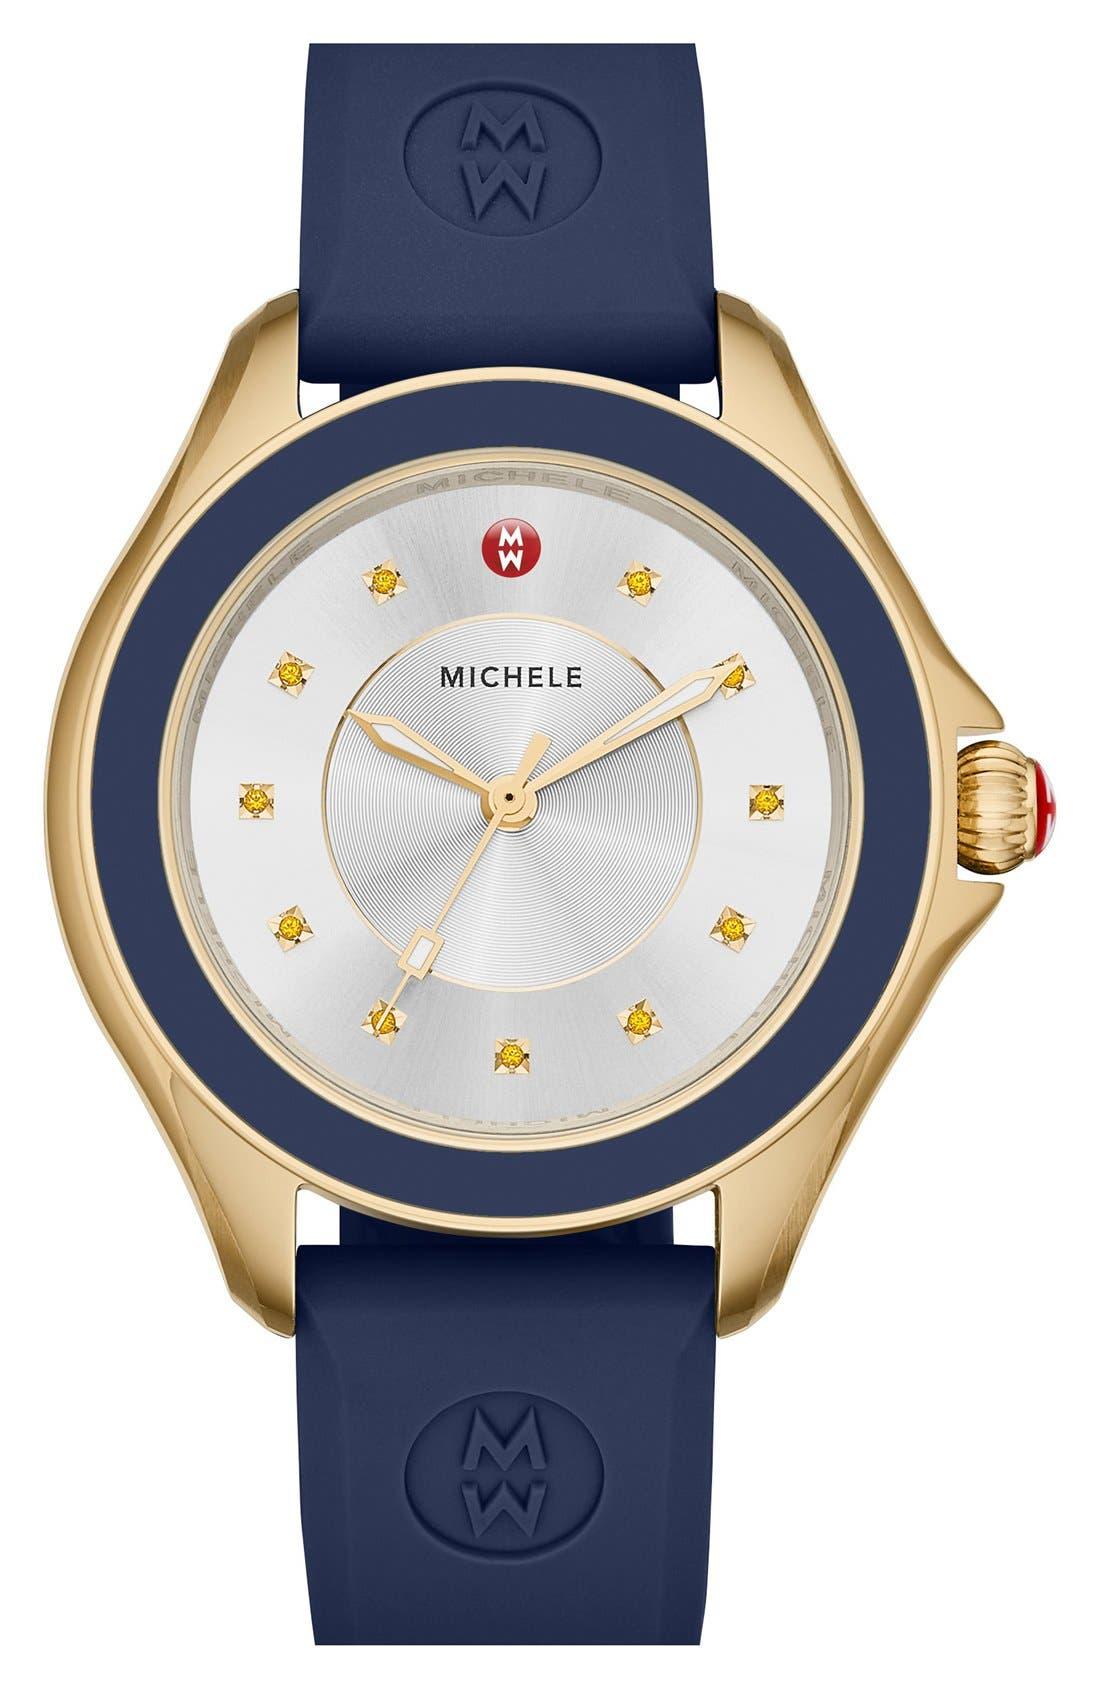 MICHELE Cape Topaz Dial Silicone Strap Watch, 40mm